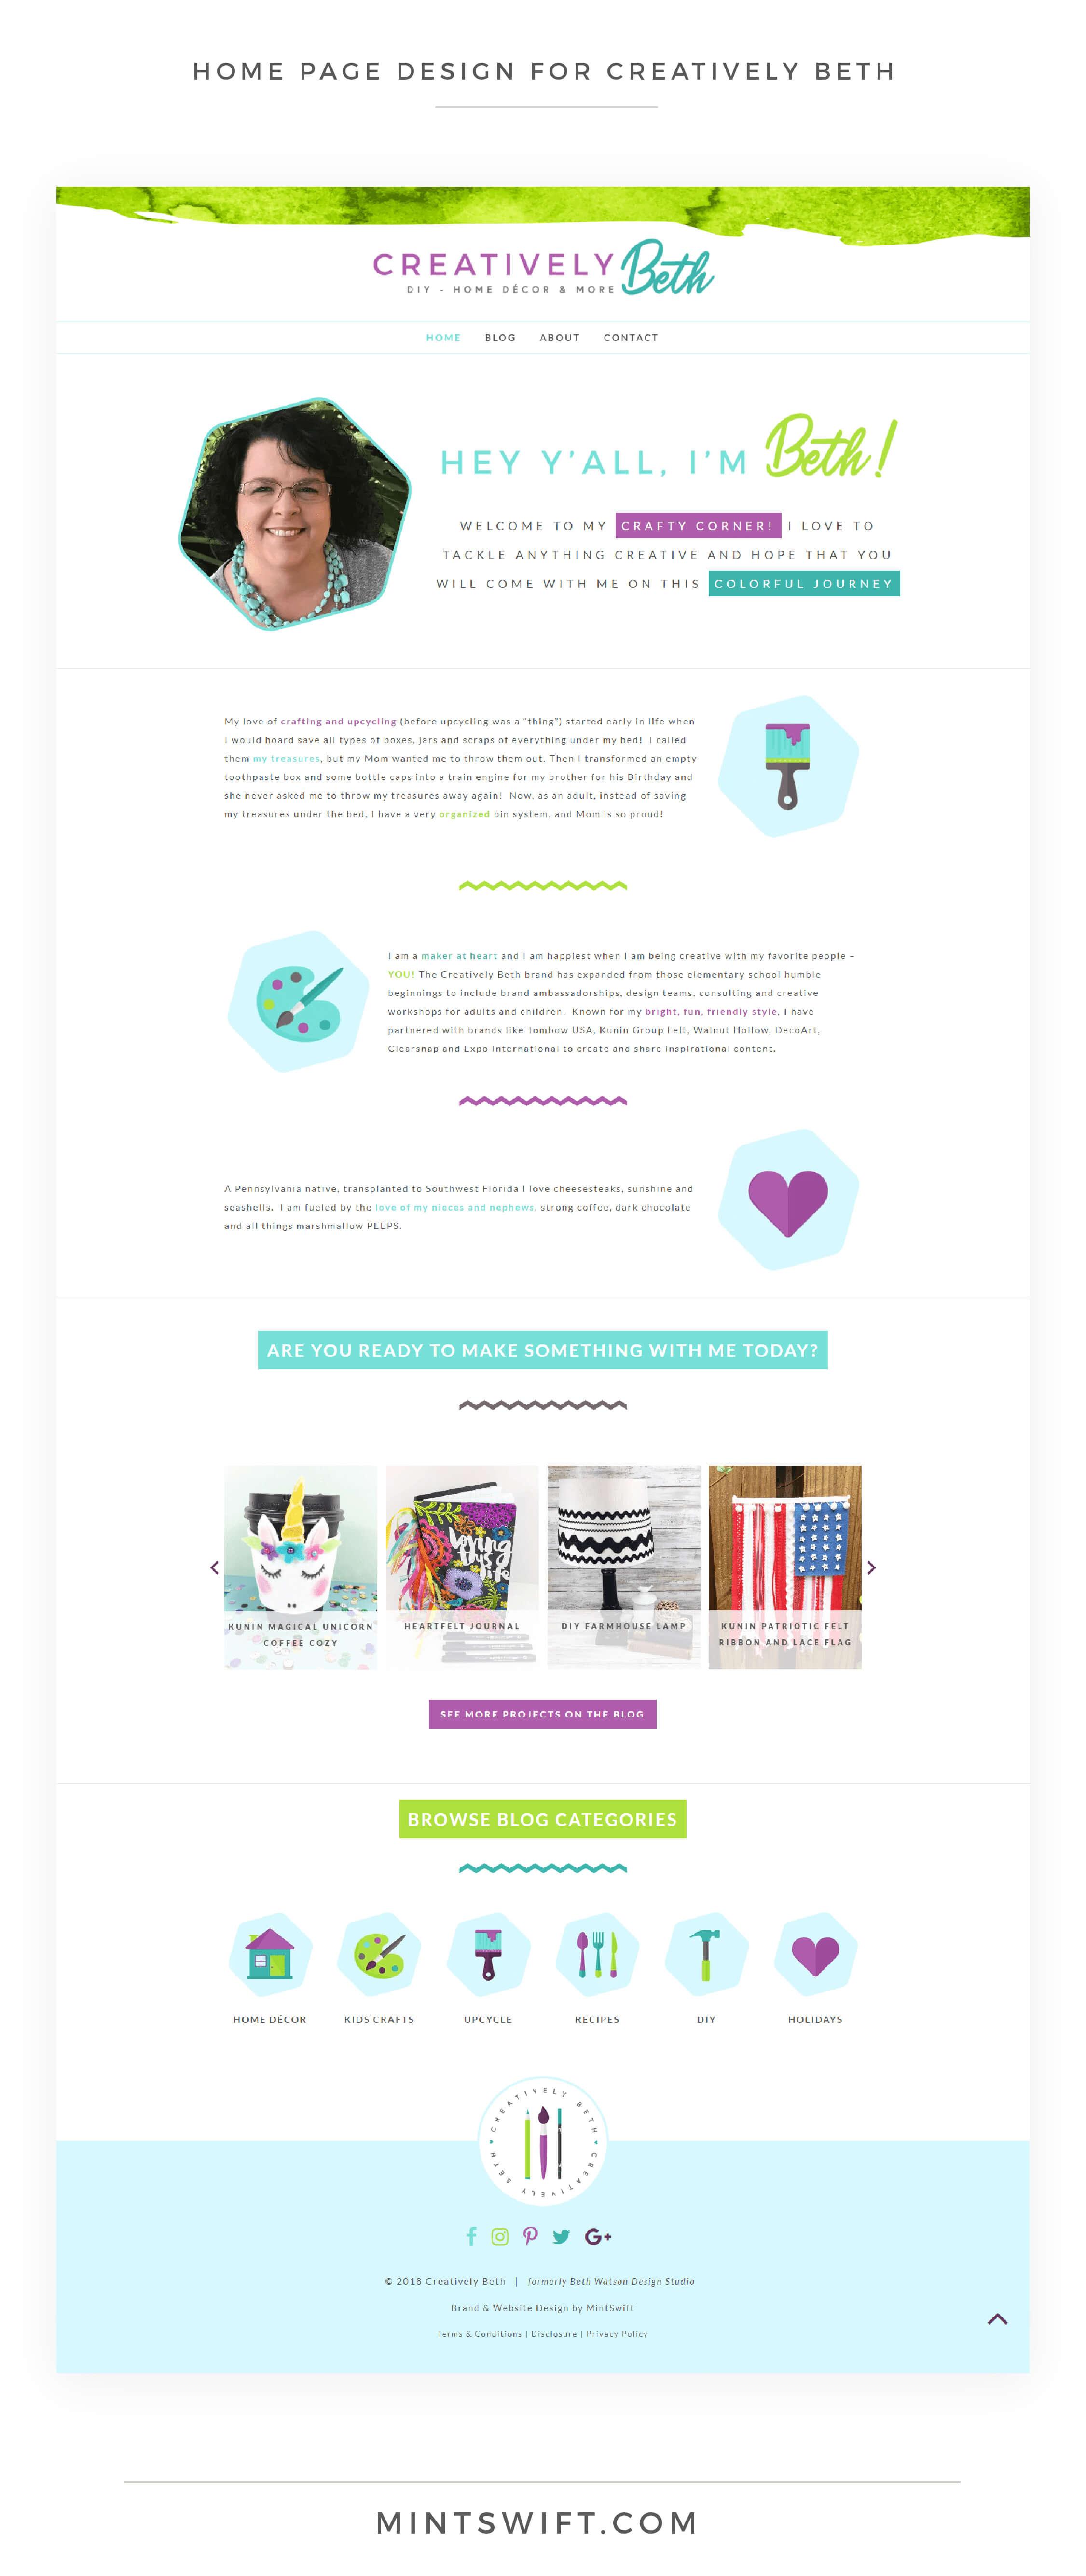 Creatively Beth - Home Page Design - Brand & Website Design - MintSwift